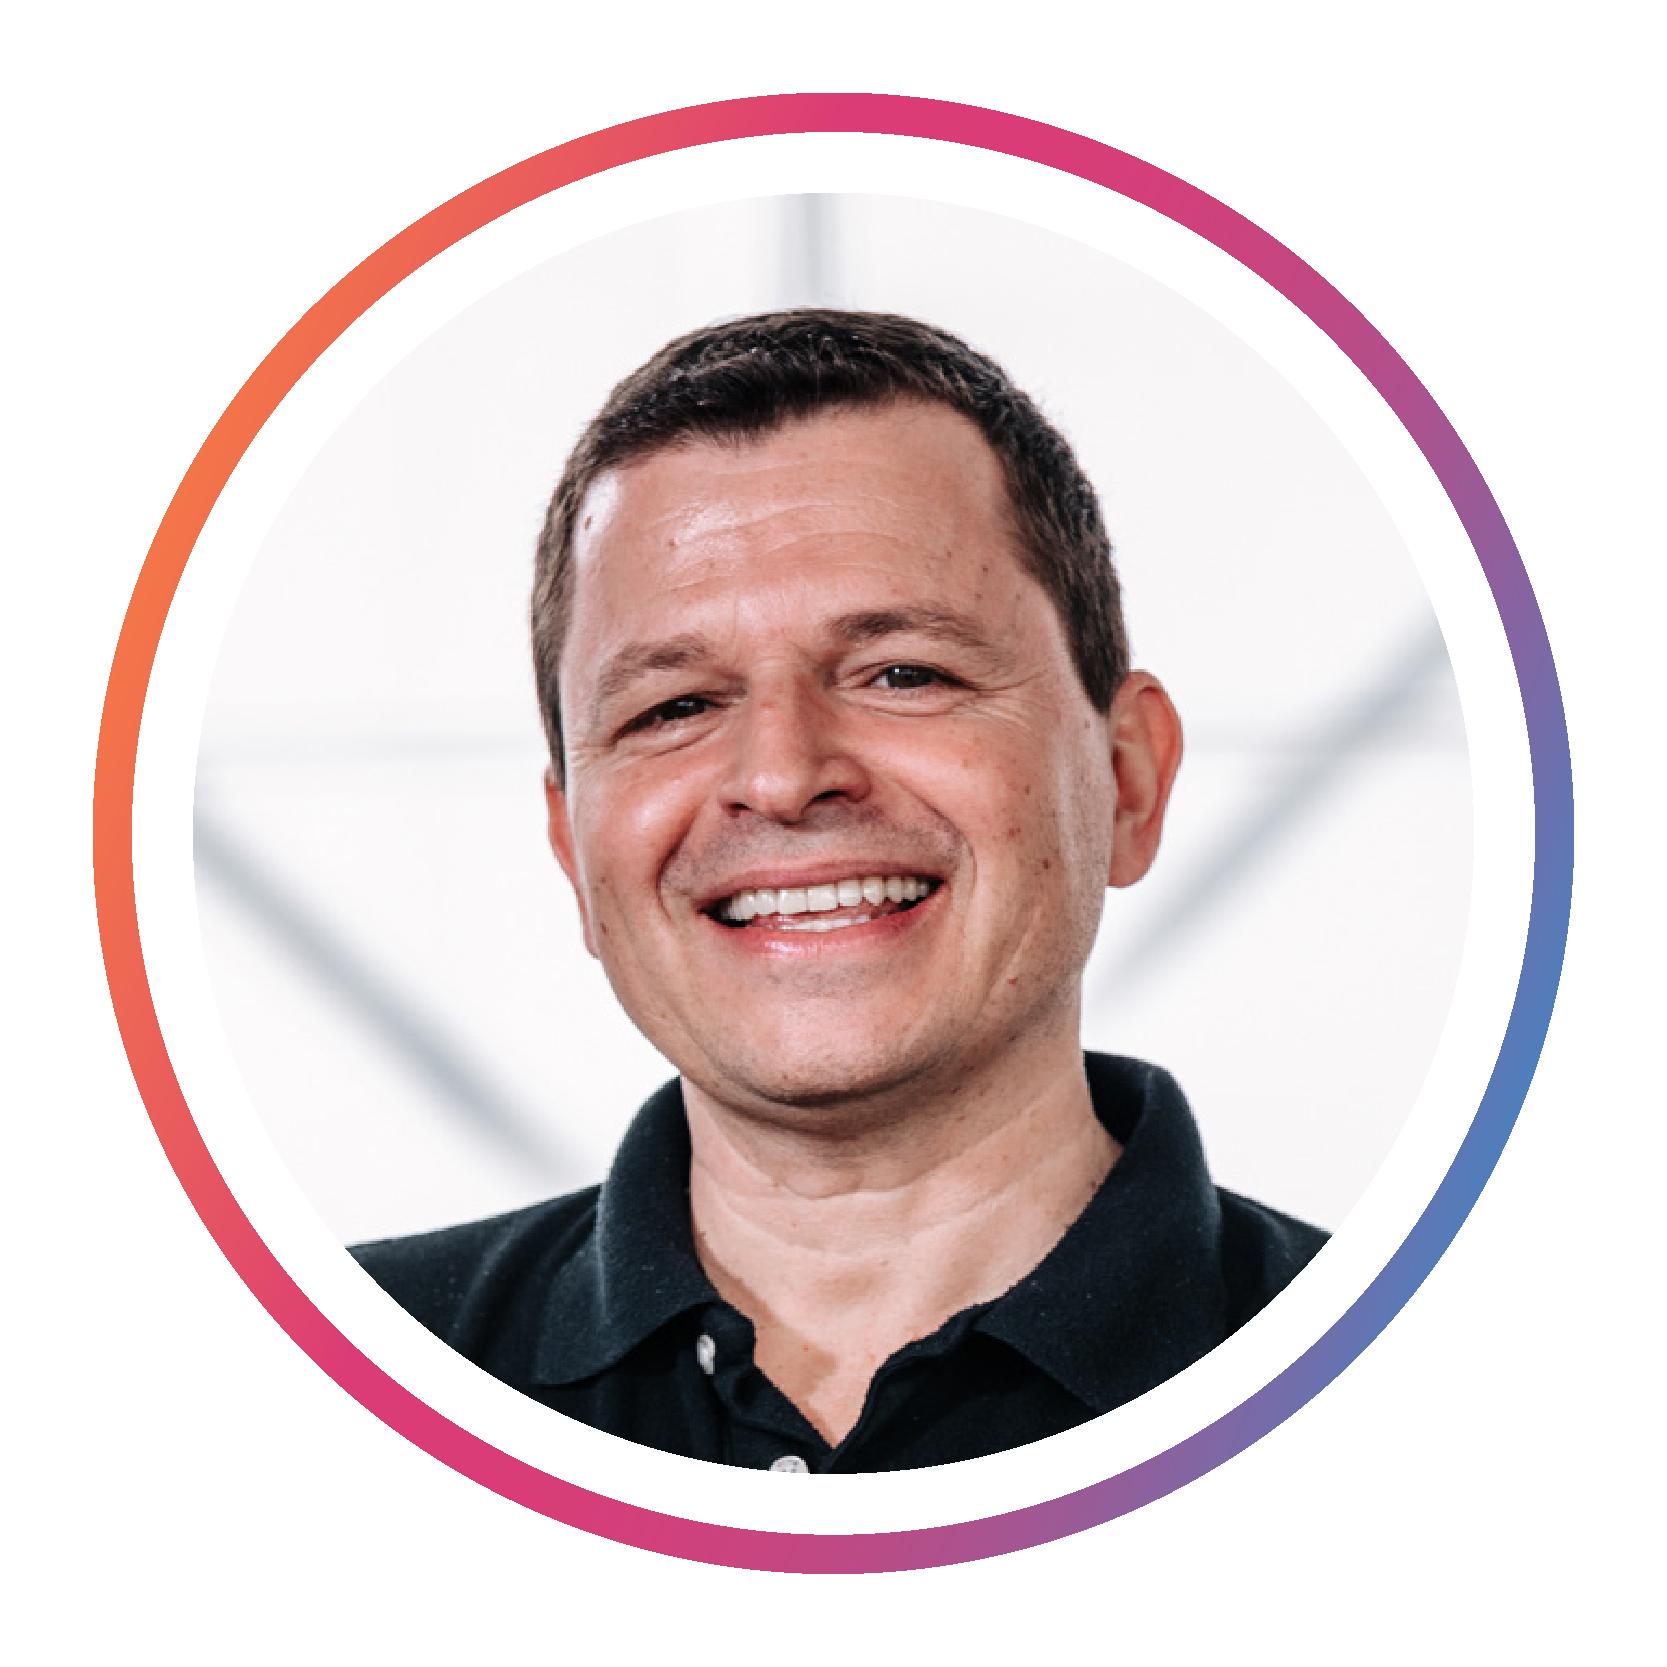 Nuno Machado Lopes | Leadership Expert